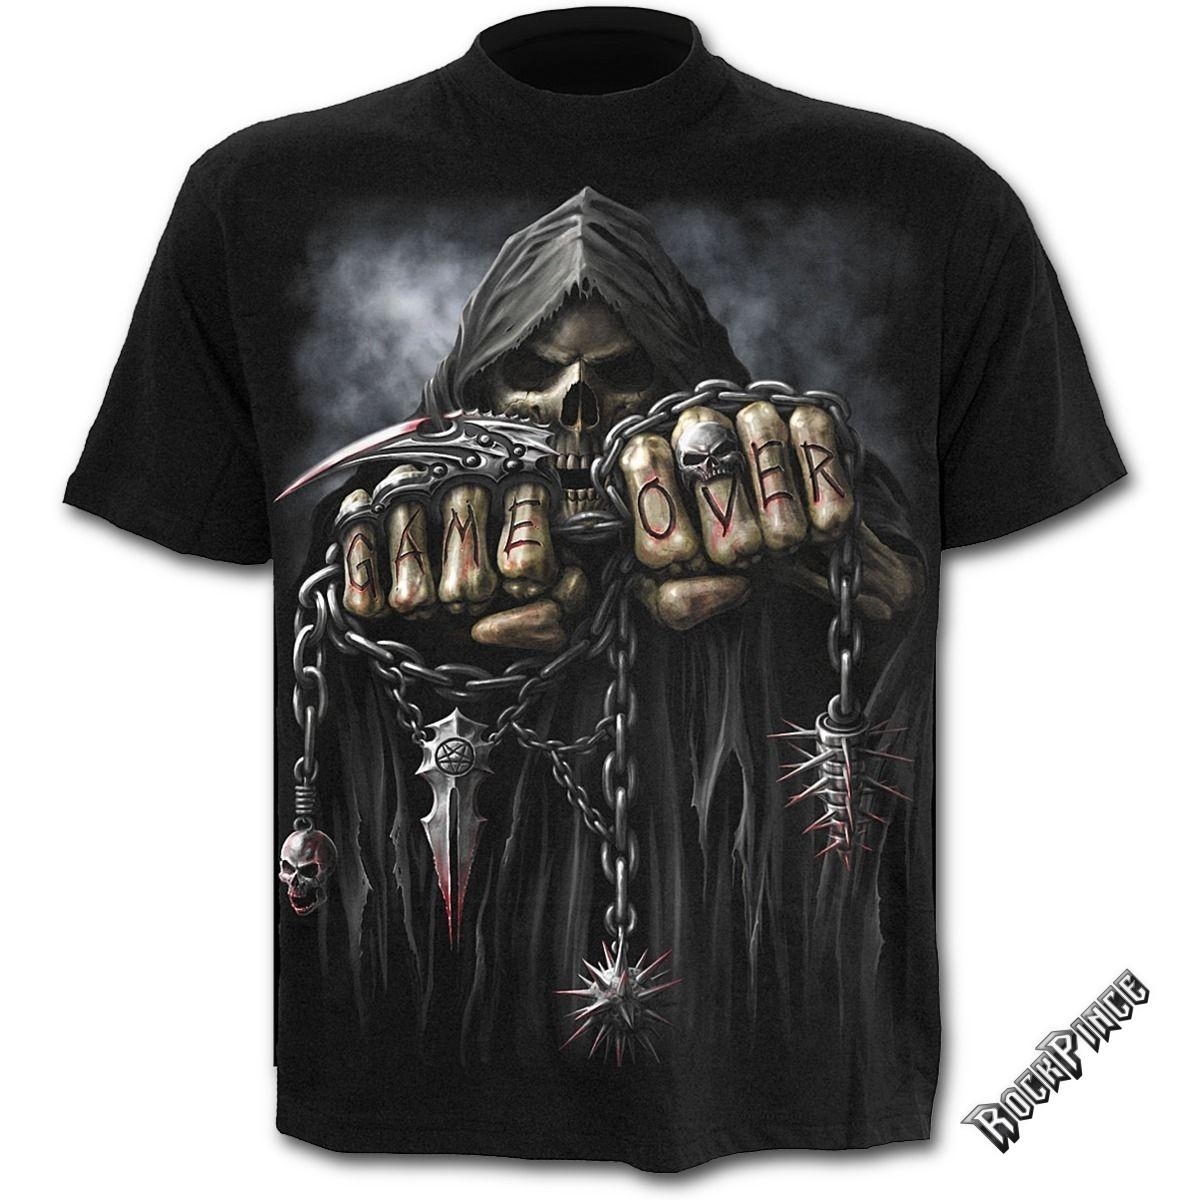 GAME OVER - Kids T-Shirt Black (Plain) - T026K101